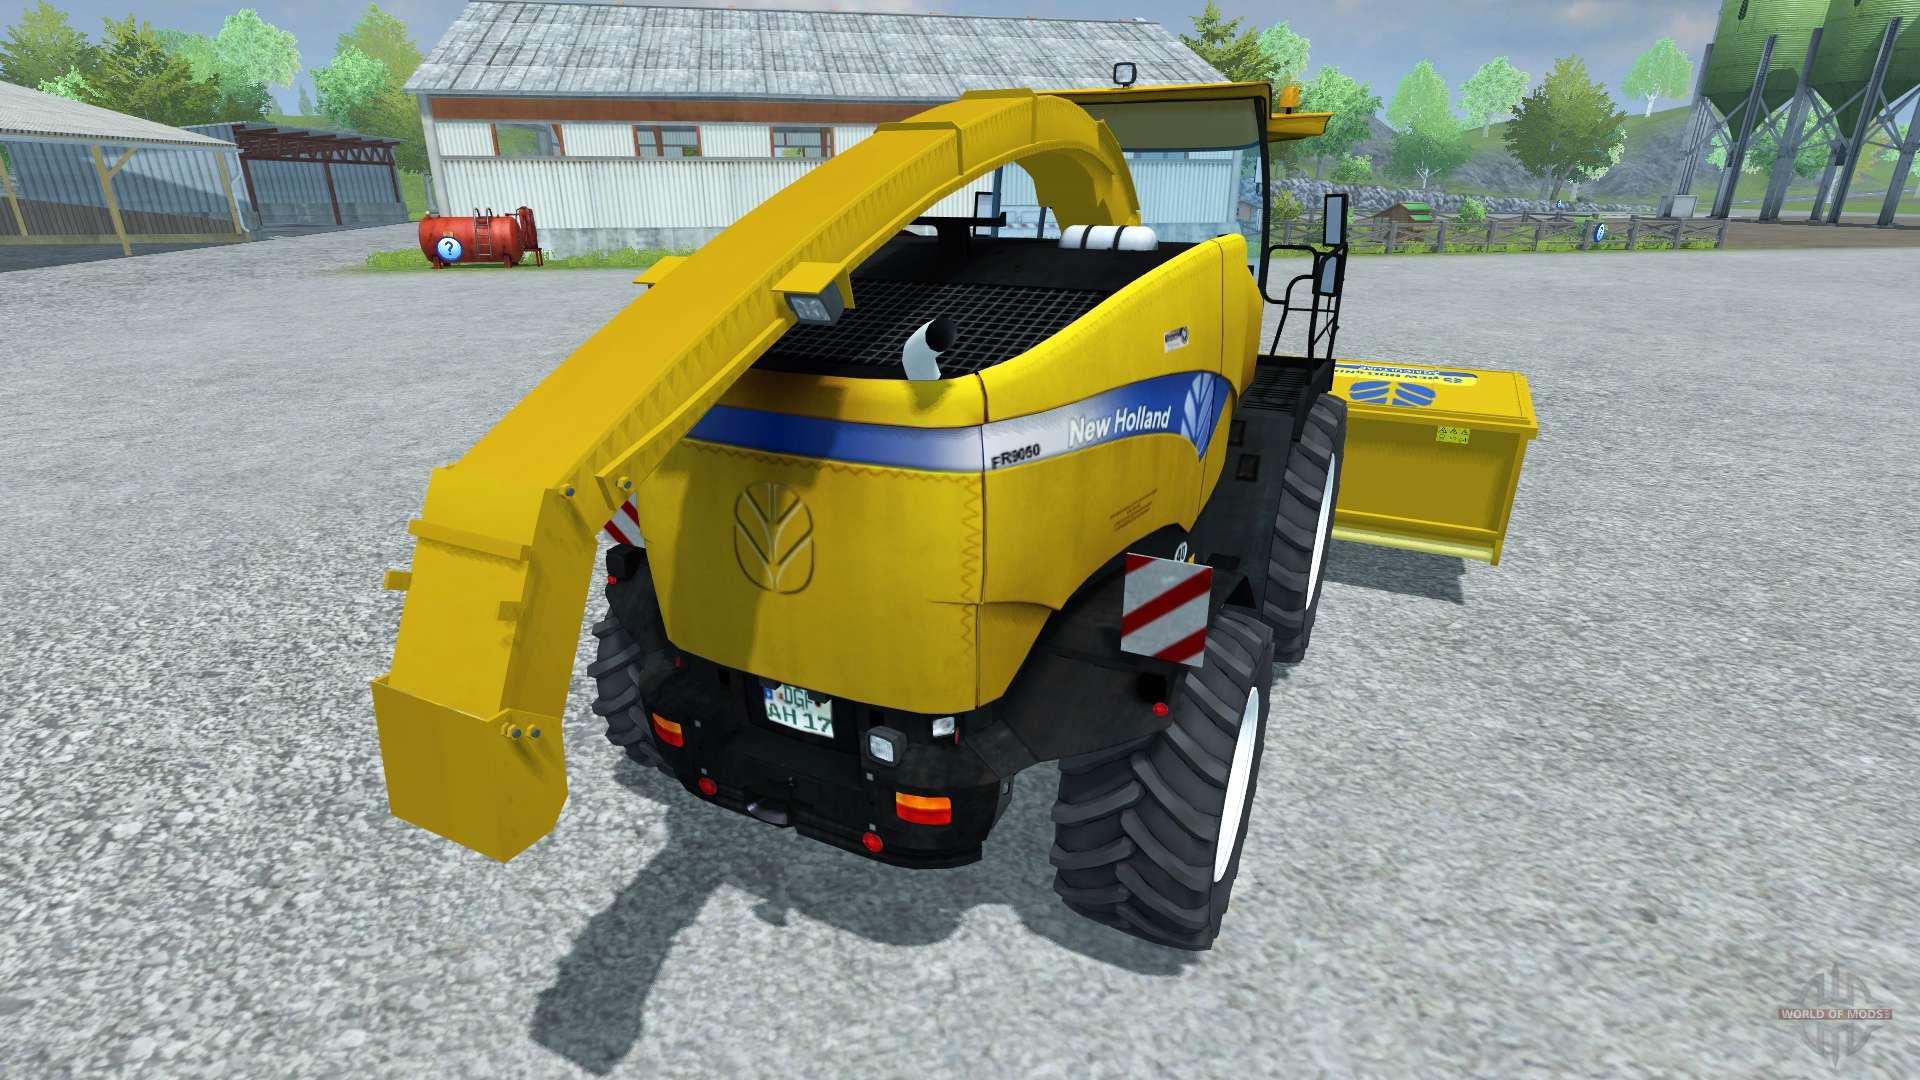 Holland FR For Farming Simulator - Argentina map farming simulator 2013